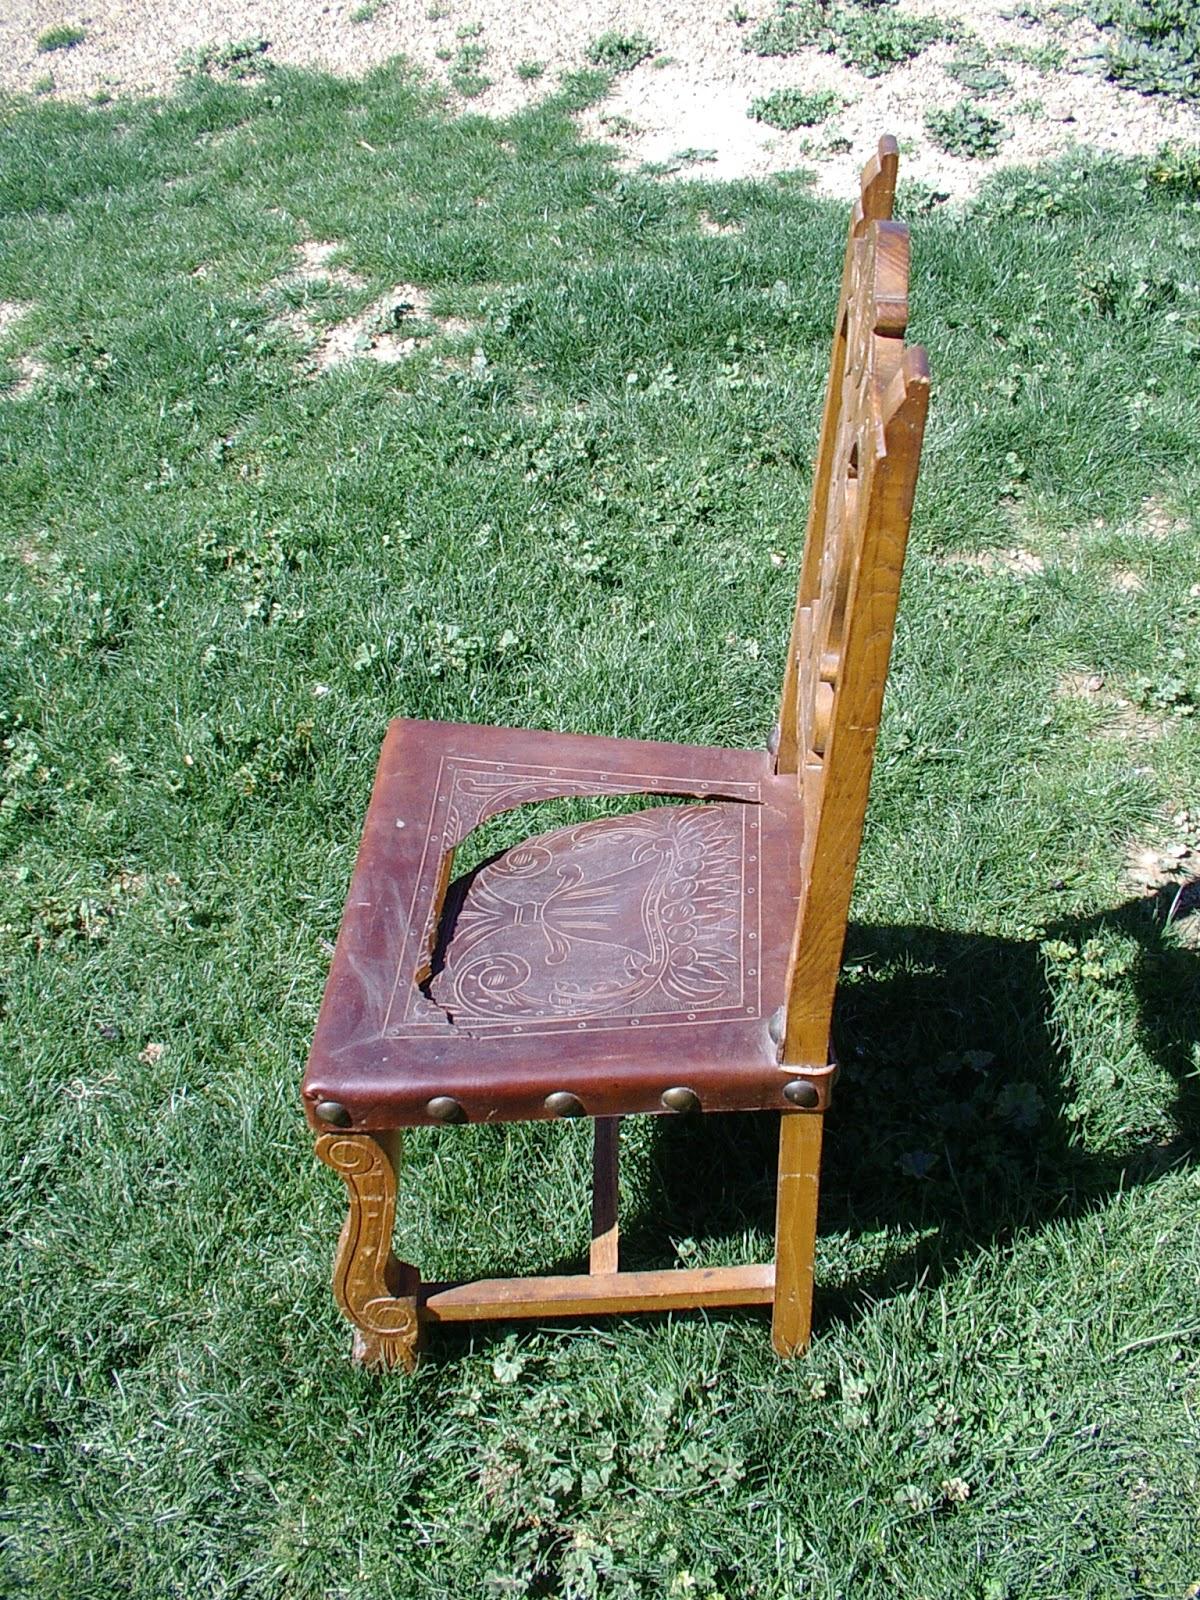 Artesania en cuero talabarte restauraci n de silla antigua - Restauracion de sillas ...